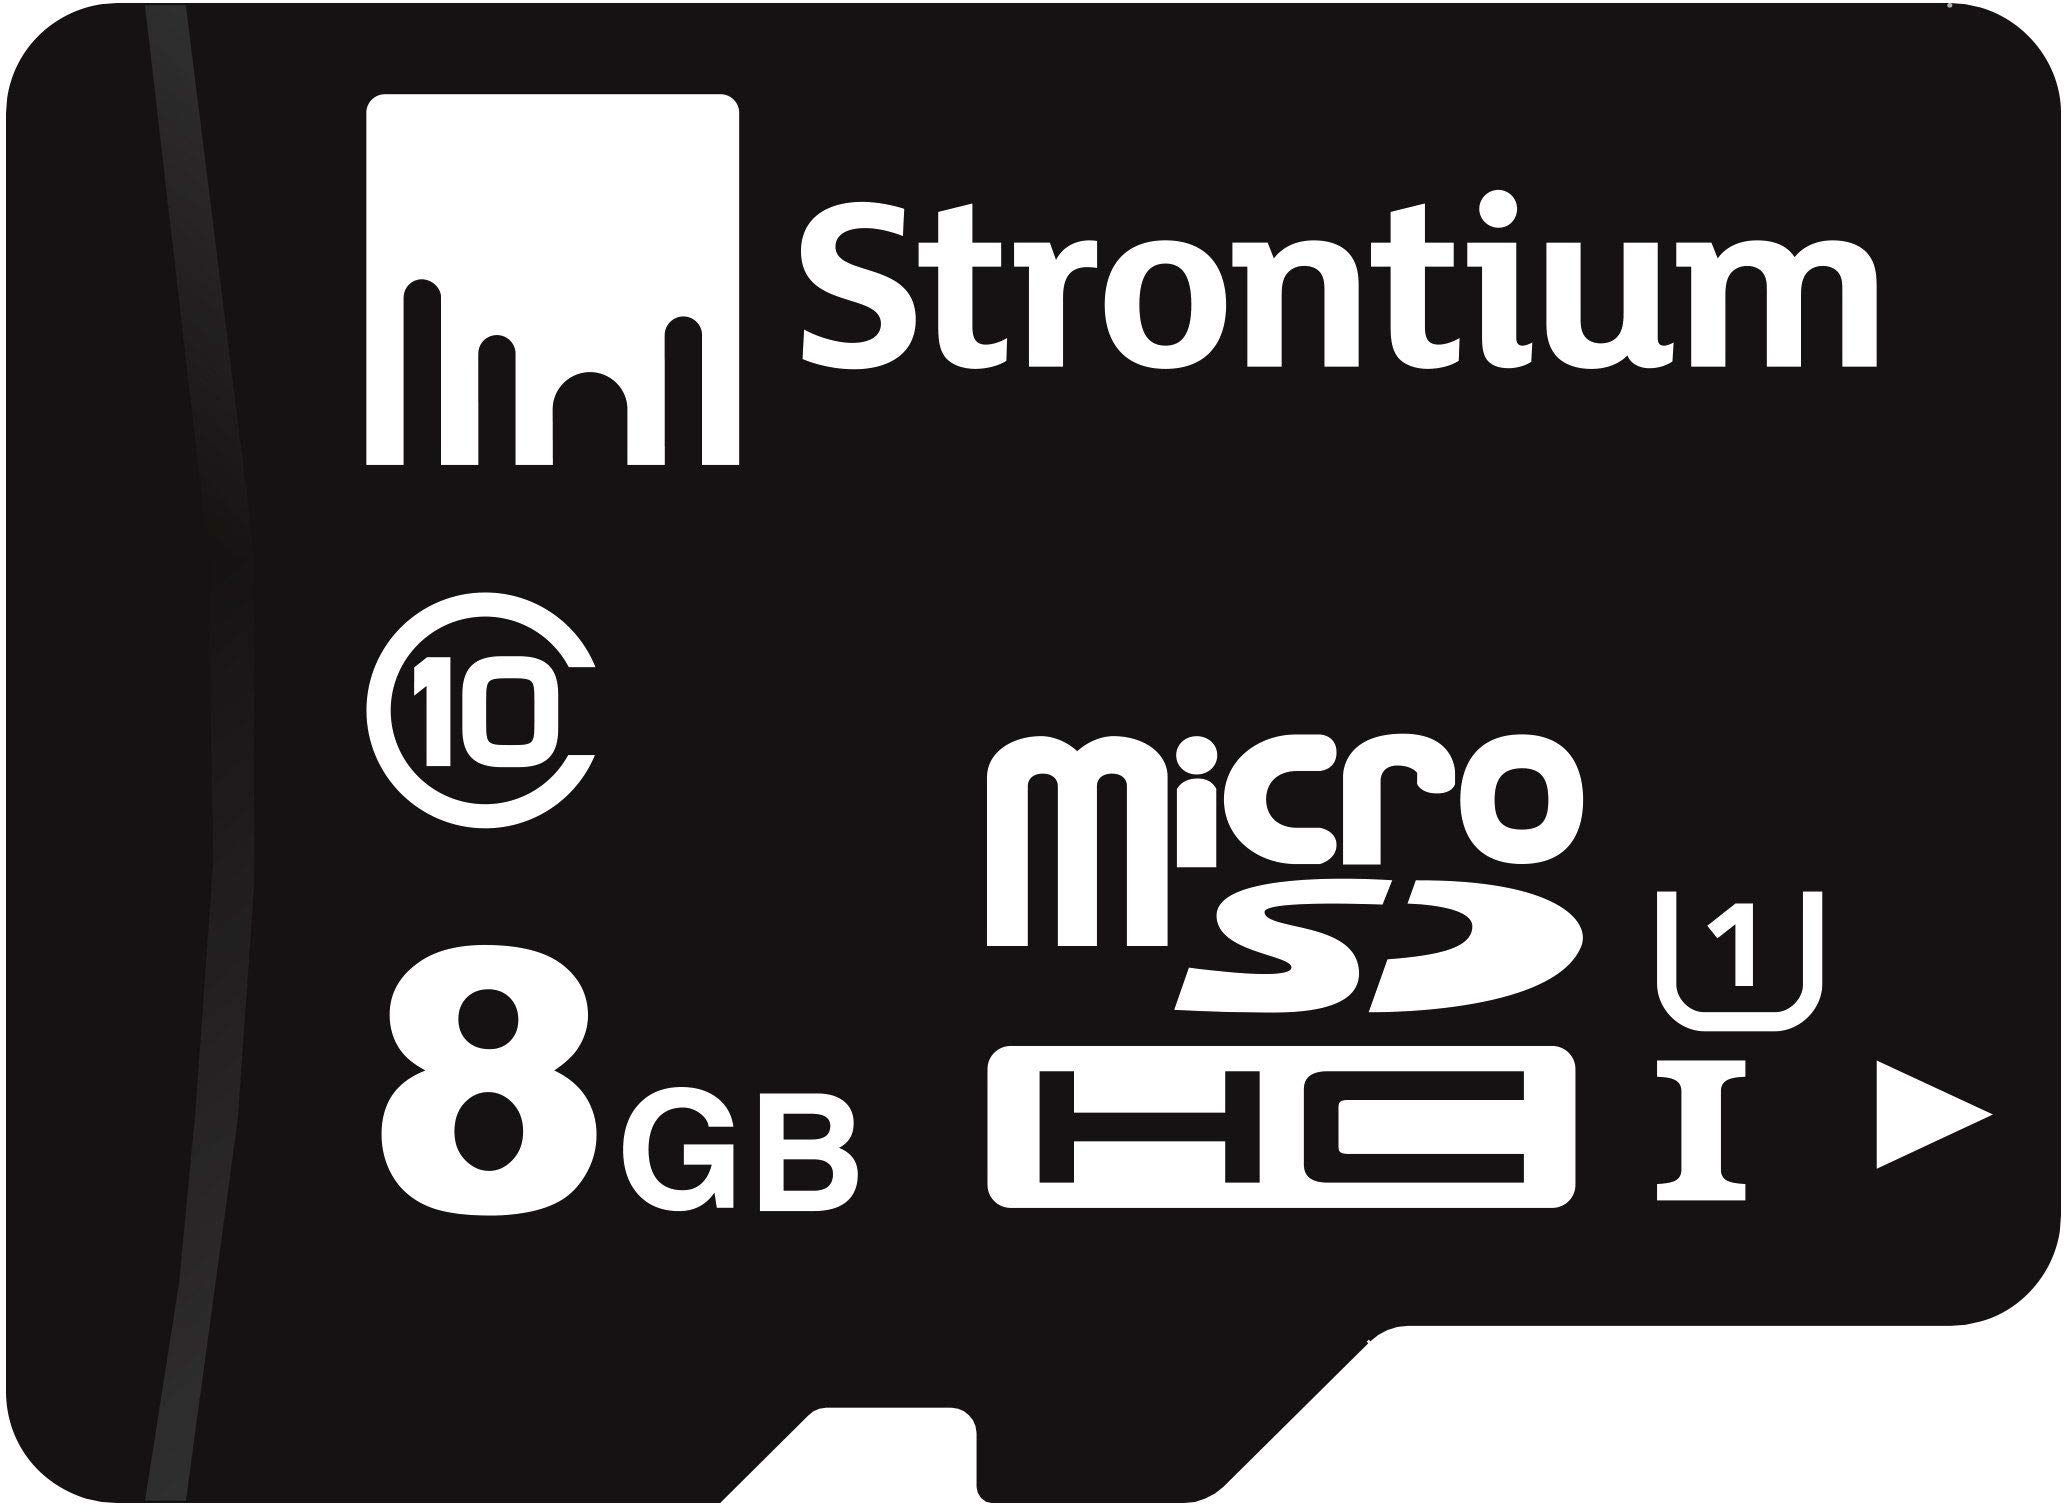 strontium microsd class 10 8gb memory card (black) - 61BZELJaHqL - Strontium MicroSD Class 10 8GB Memory Card (Black)